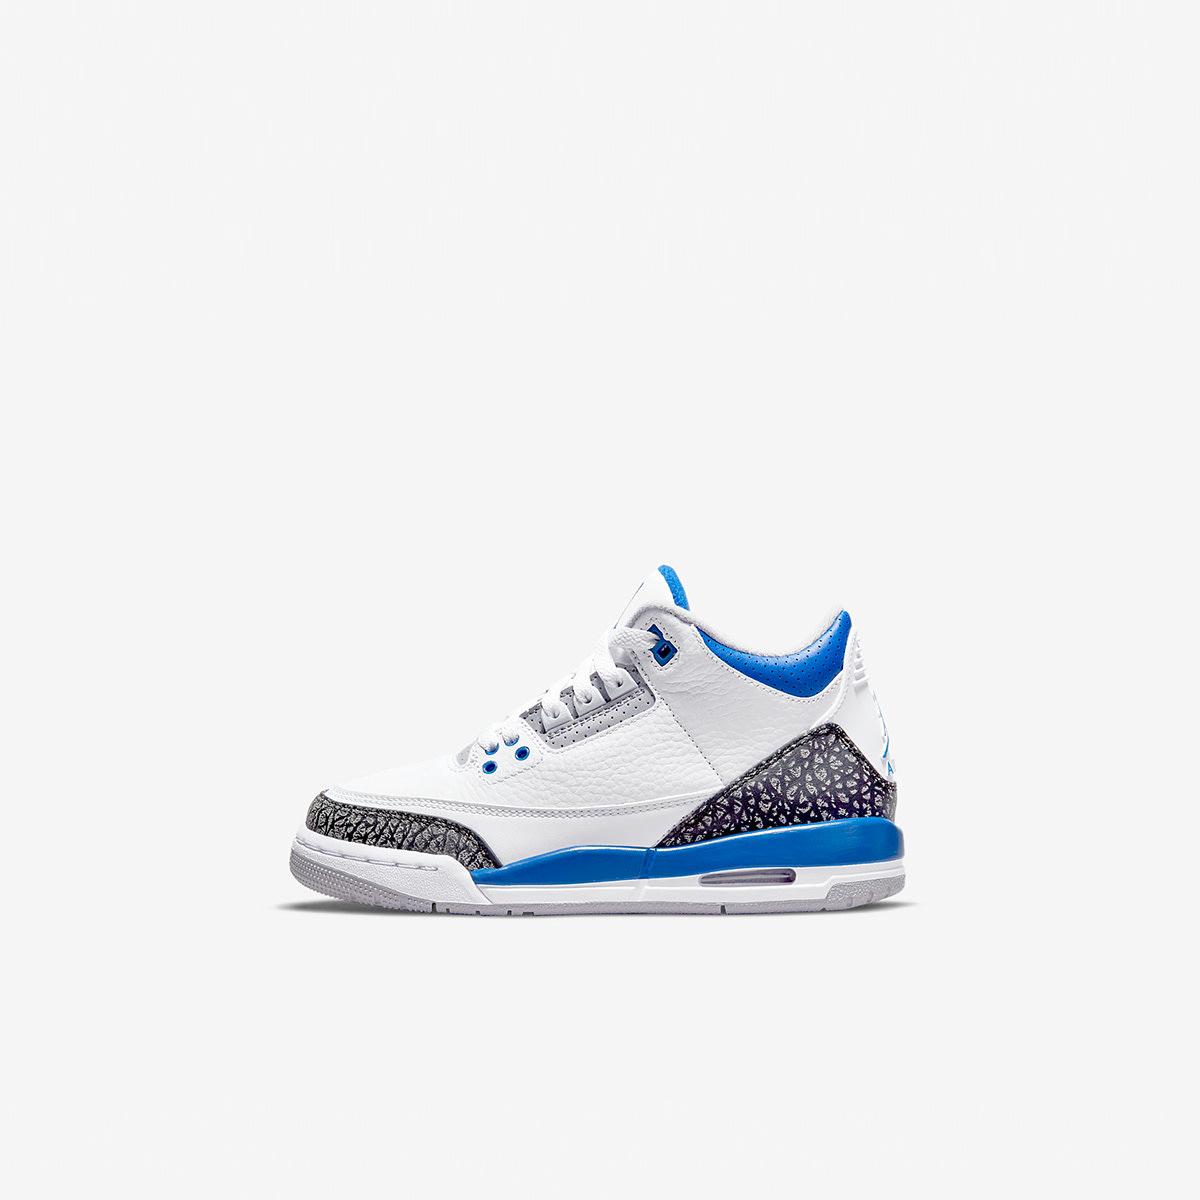 "Air Jordan 3 Retro BG ""Racer Blue"" - 398614-145"